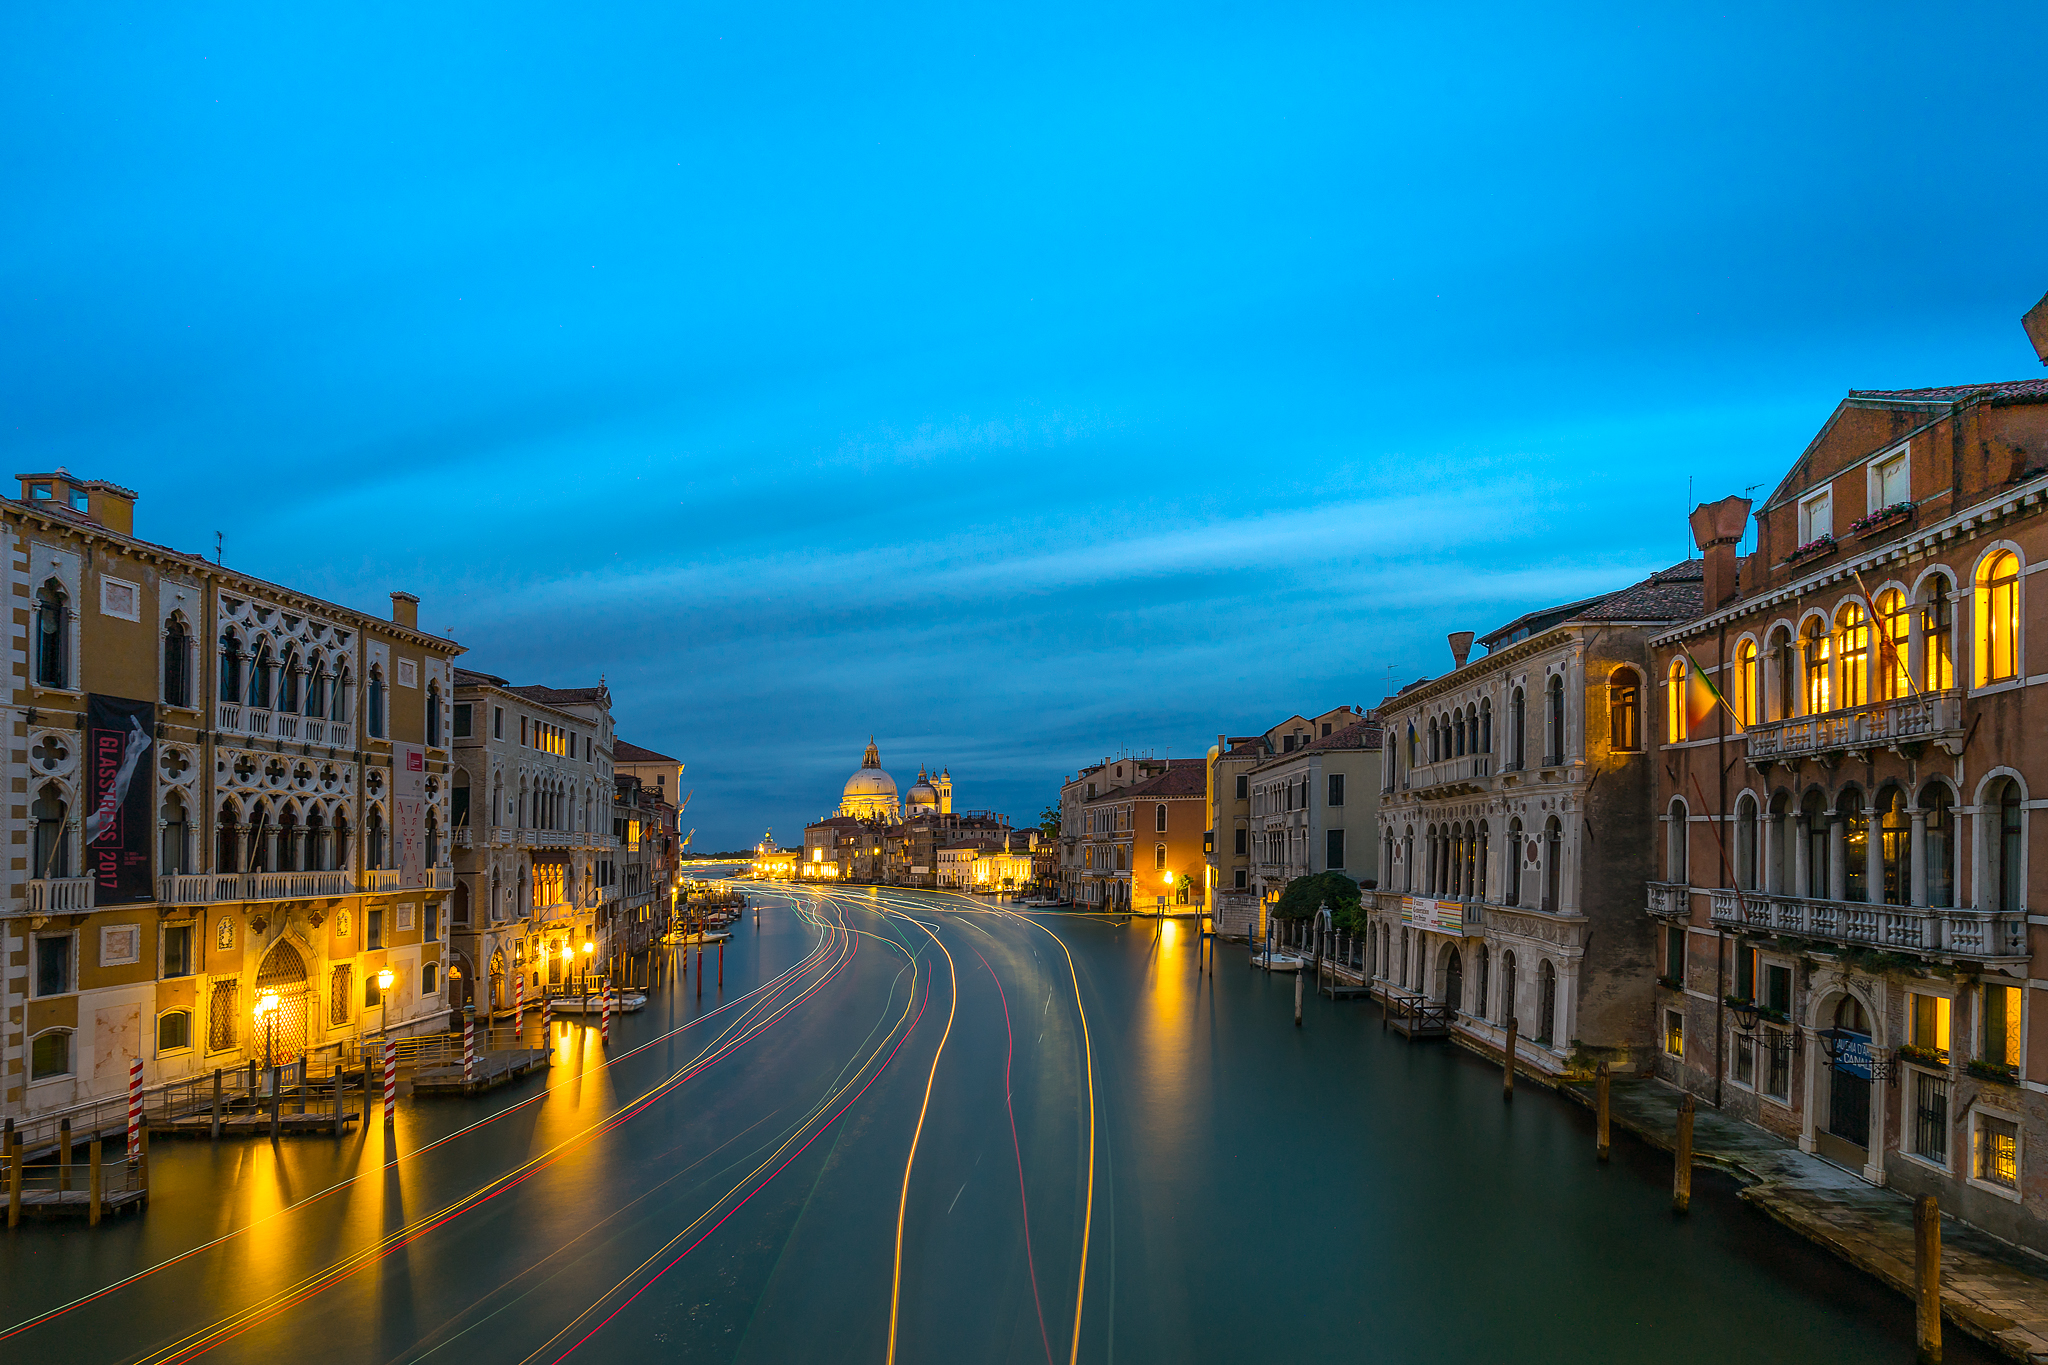 Ponte dell'Accademia, Italy